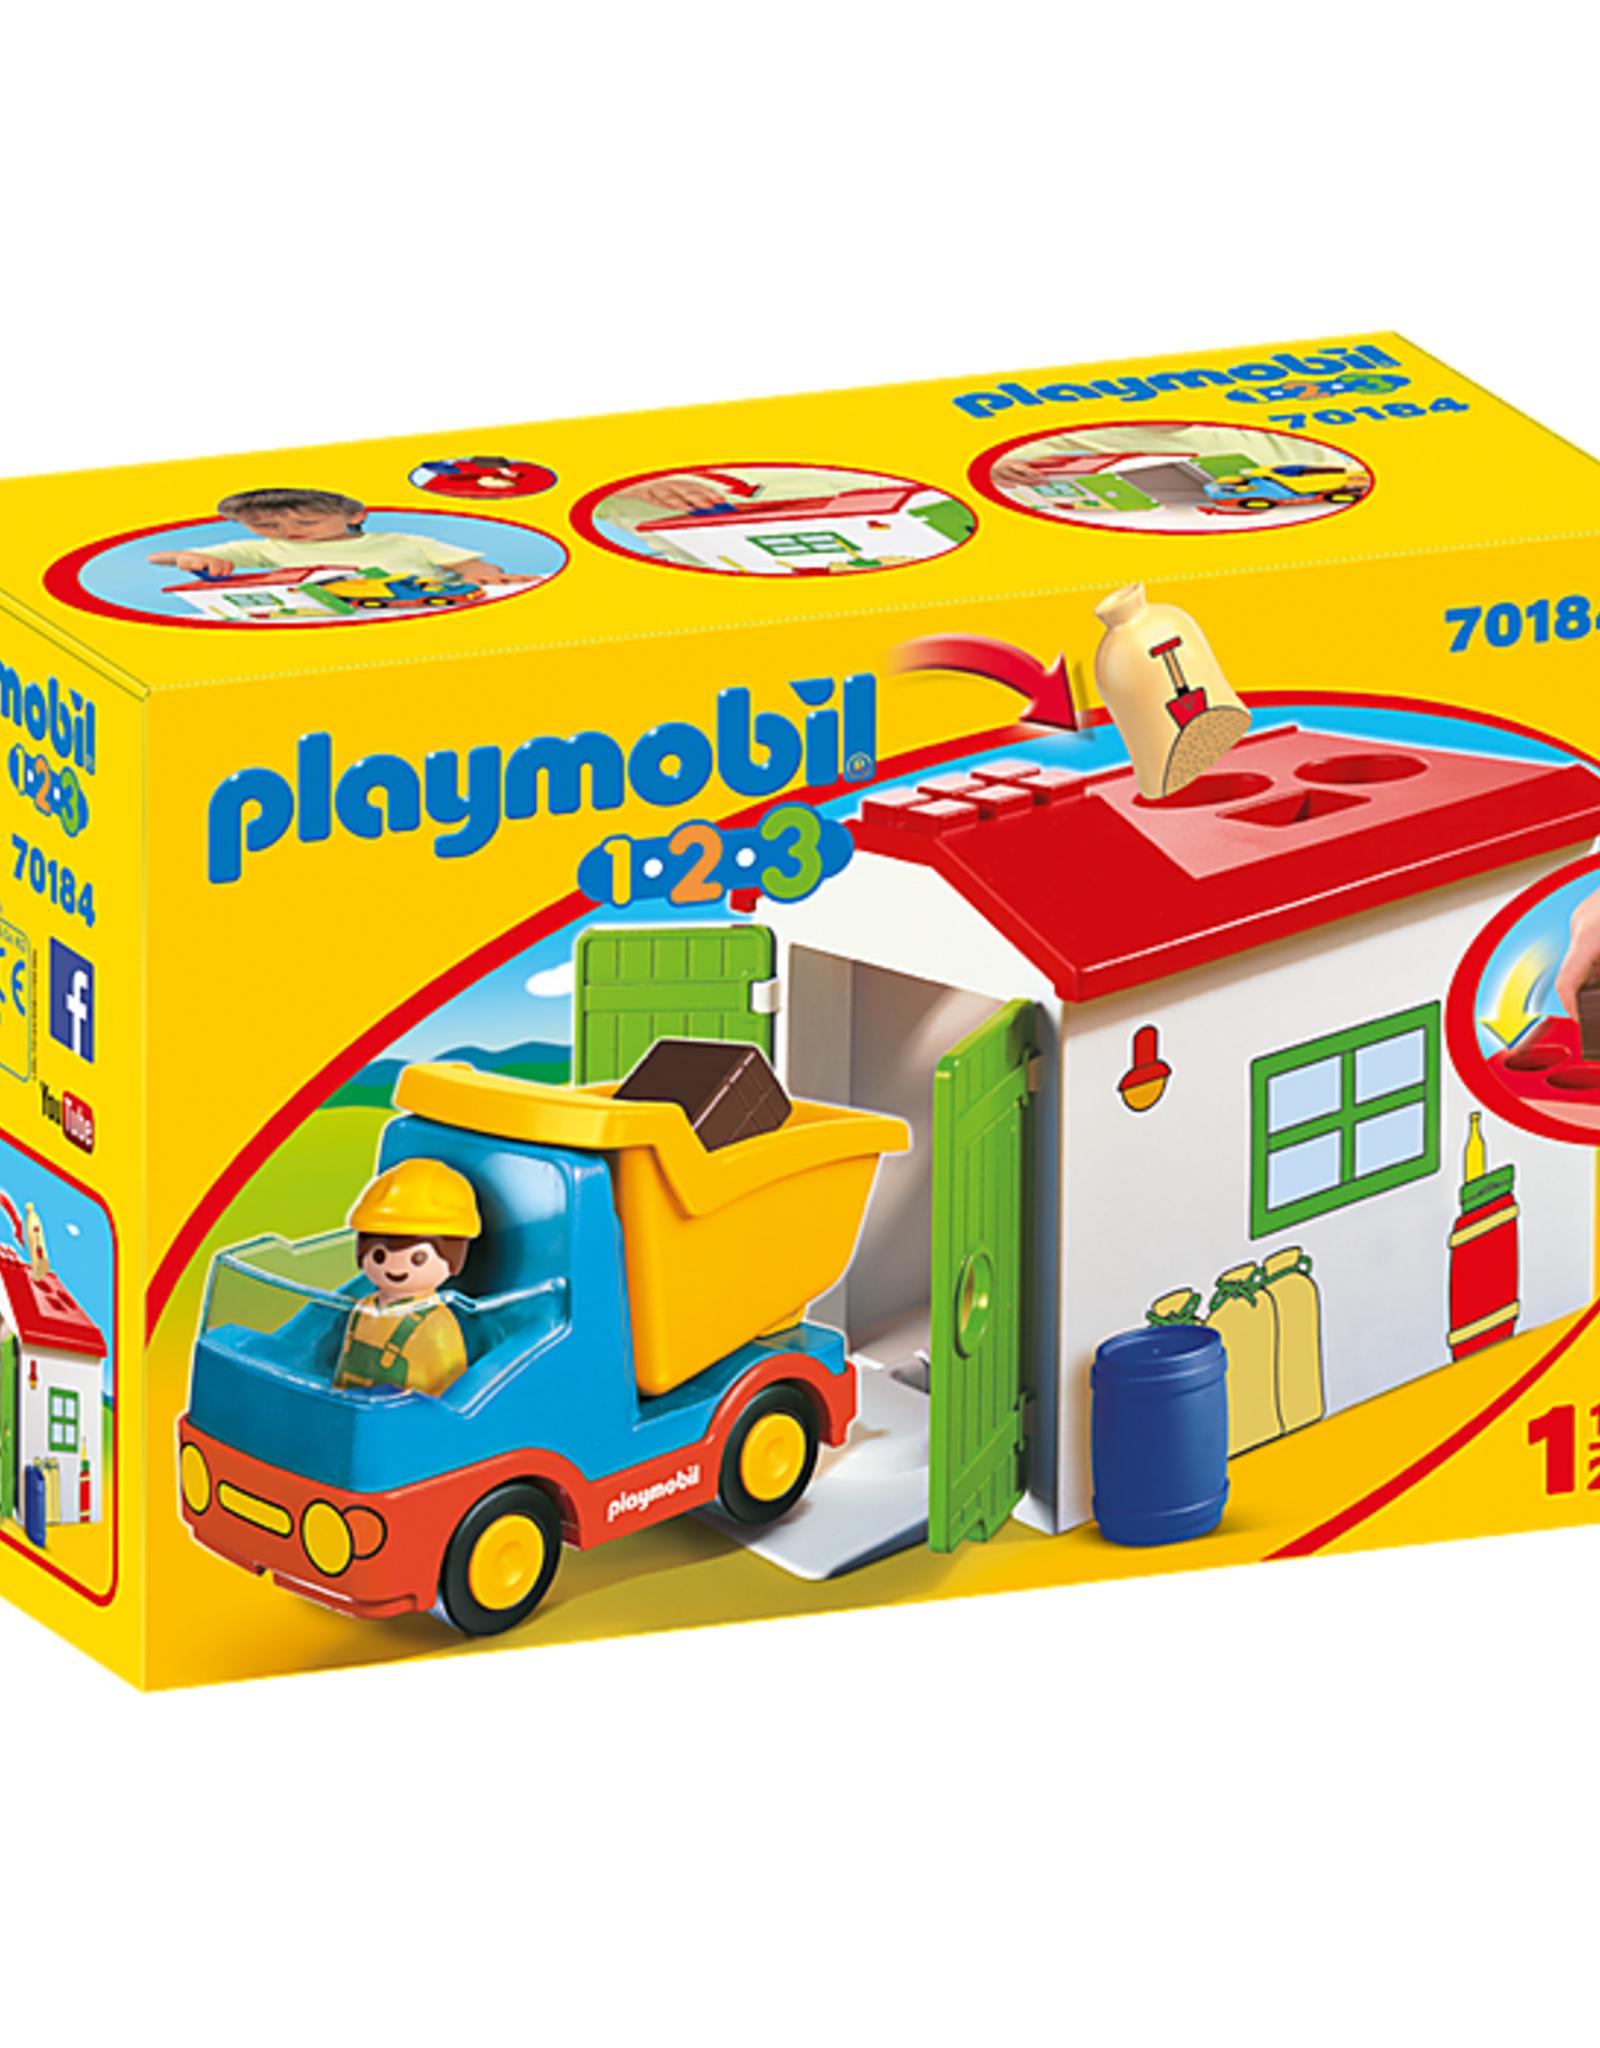 Playmobil 1,2,3 - Dump Truck with Sorting Garage